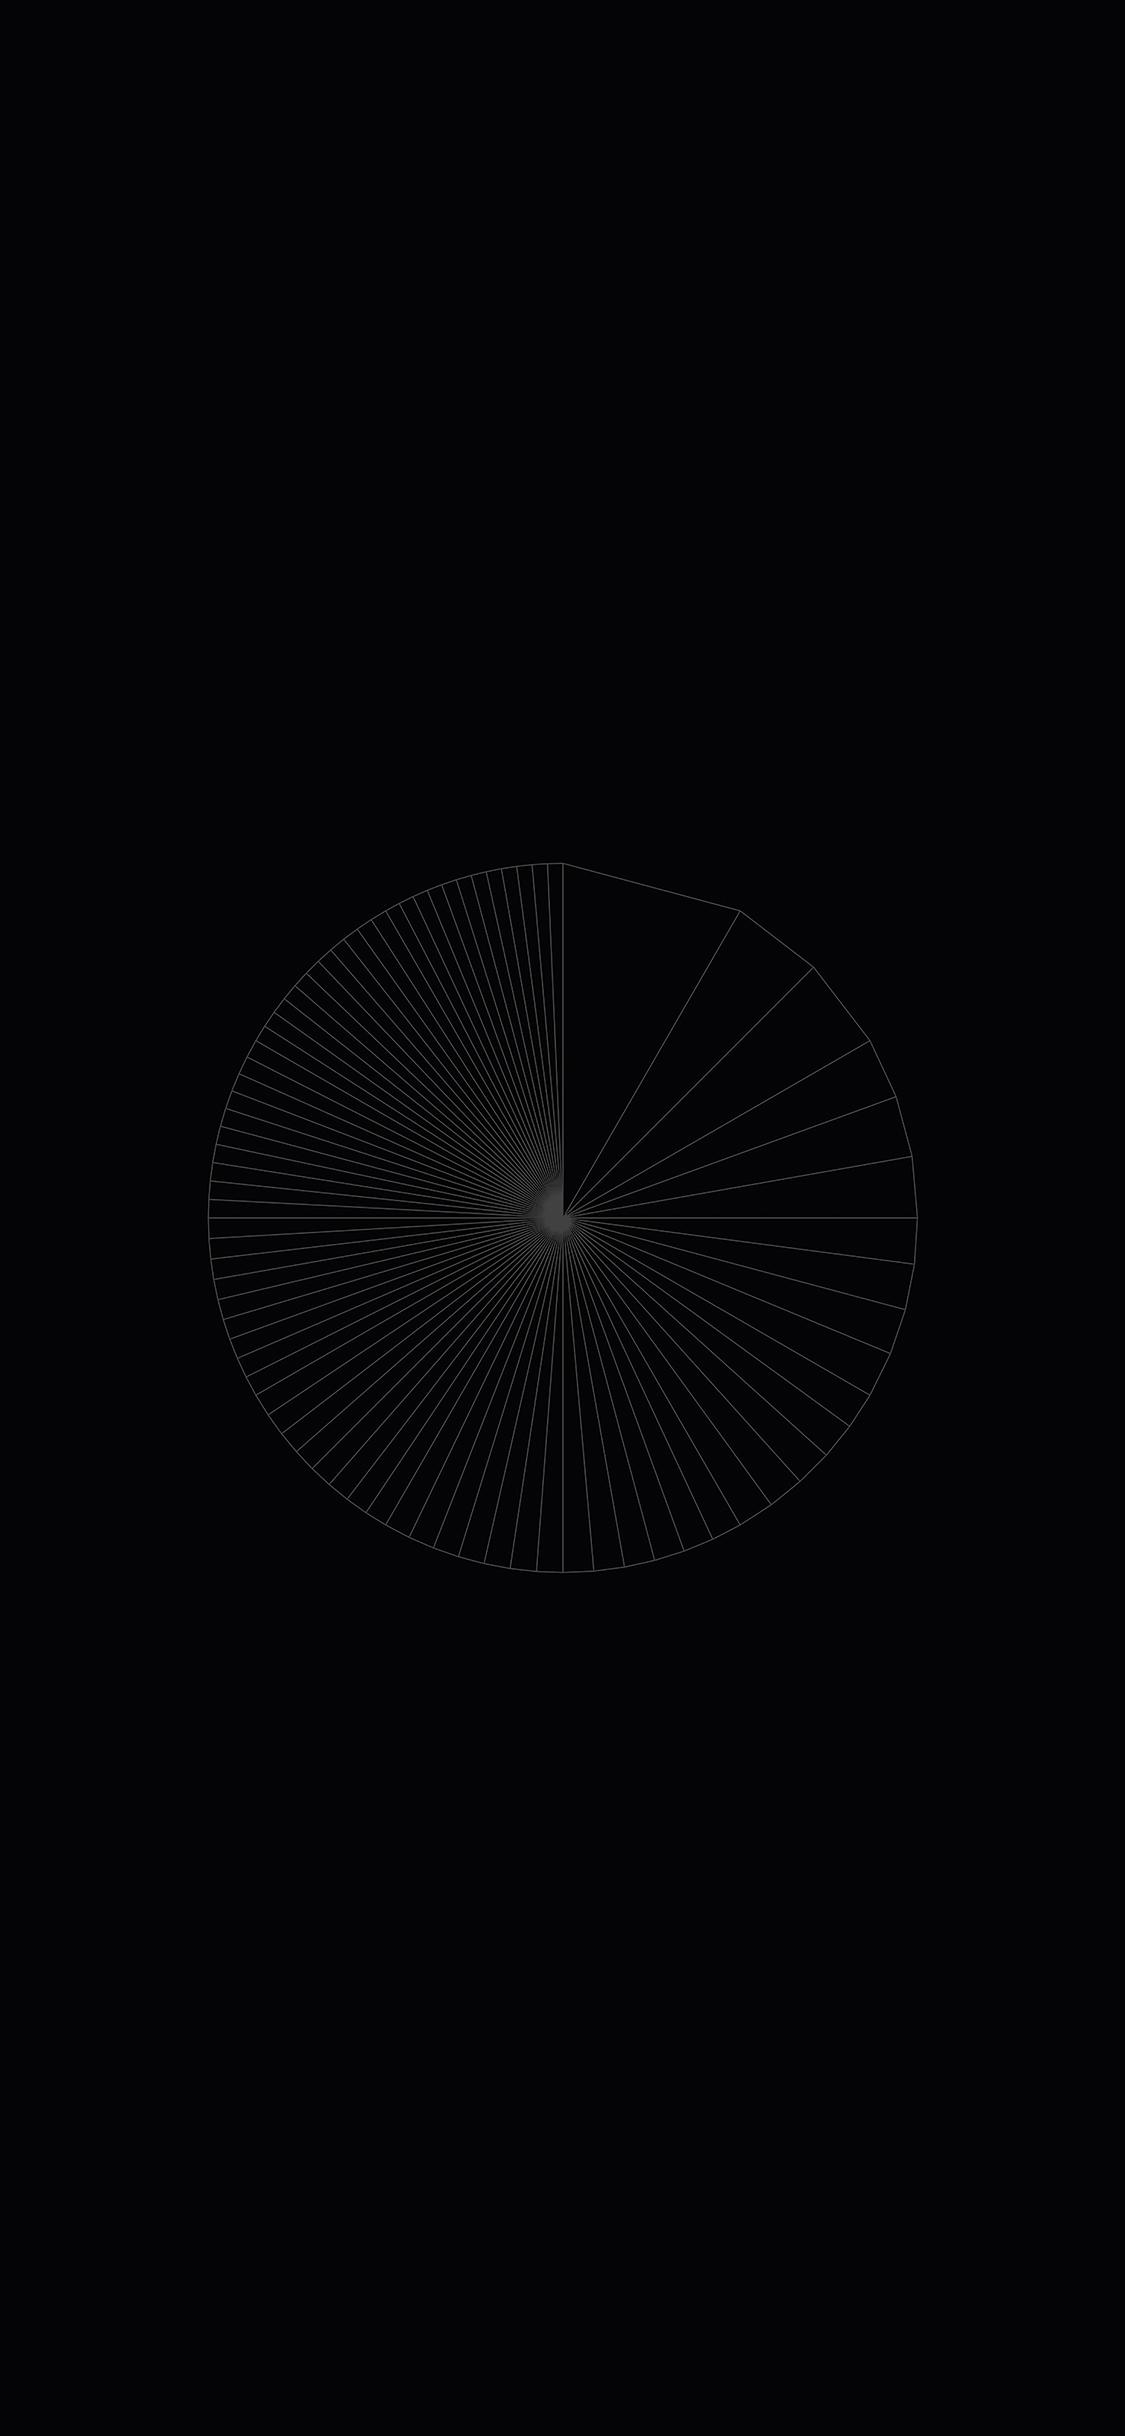 iPhoneXpapers.com-Apple-iPhone-wallpaper-af32-12-slides-dark-minimal-art